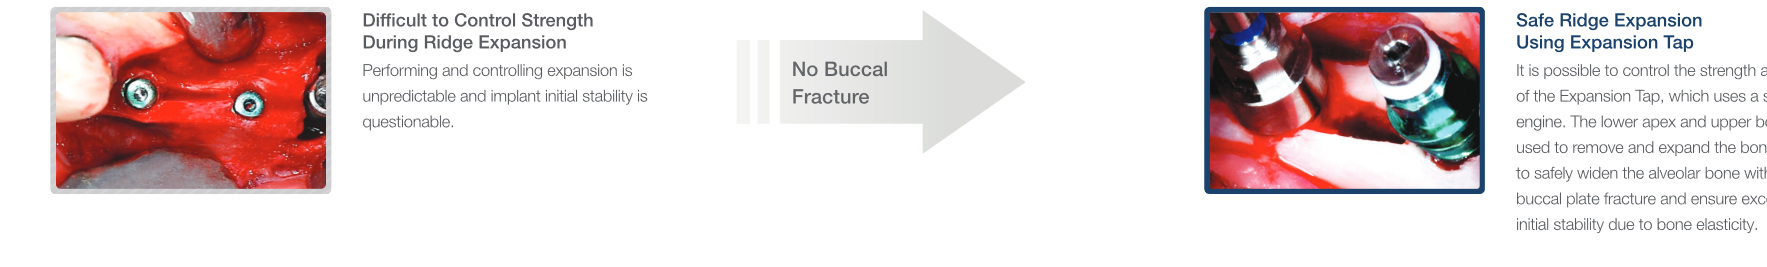 ایمپلنت،فیکسچر،implant،fixture